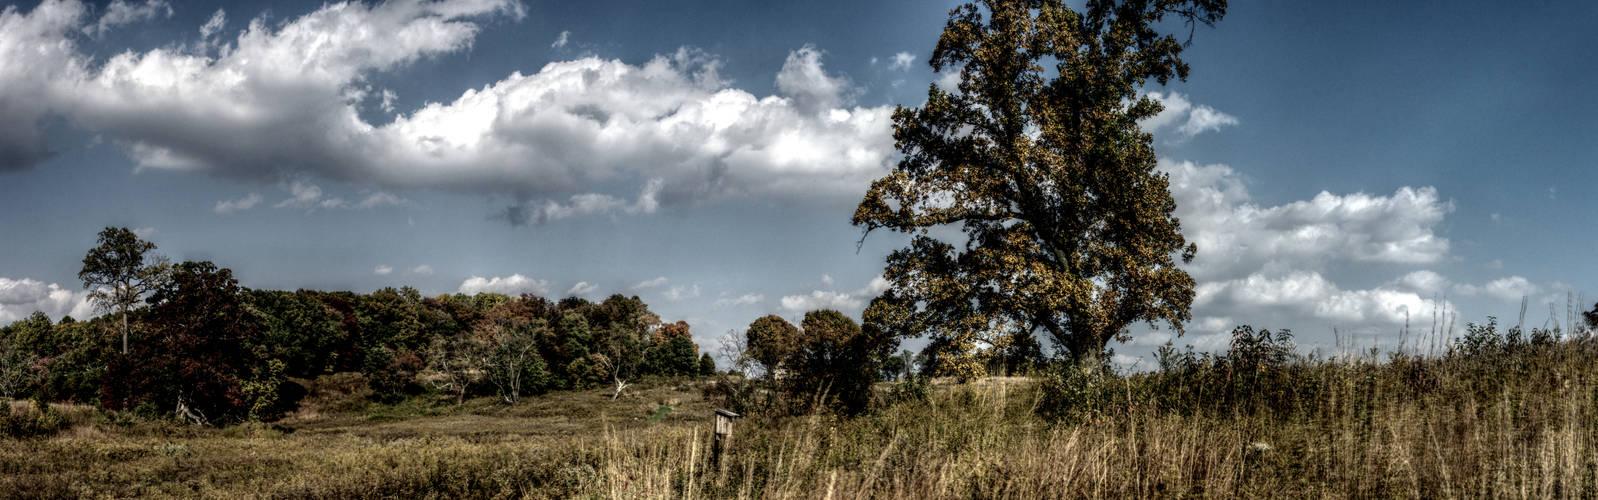 Panorama 3108 blended fused pregamma 1 mantiuk06 c by bruhinb